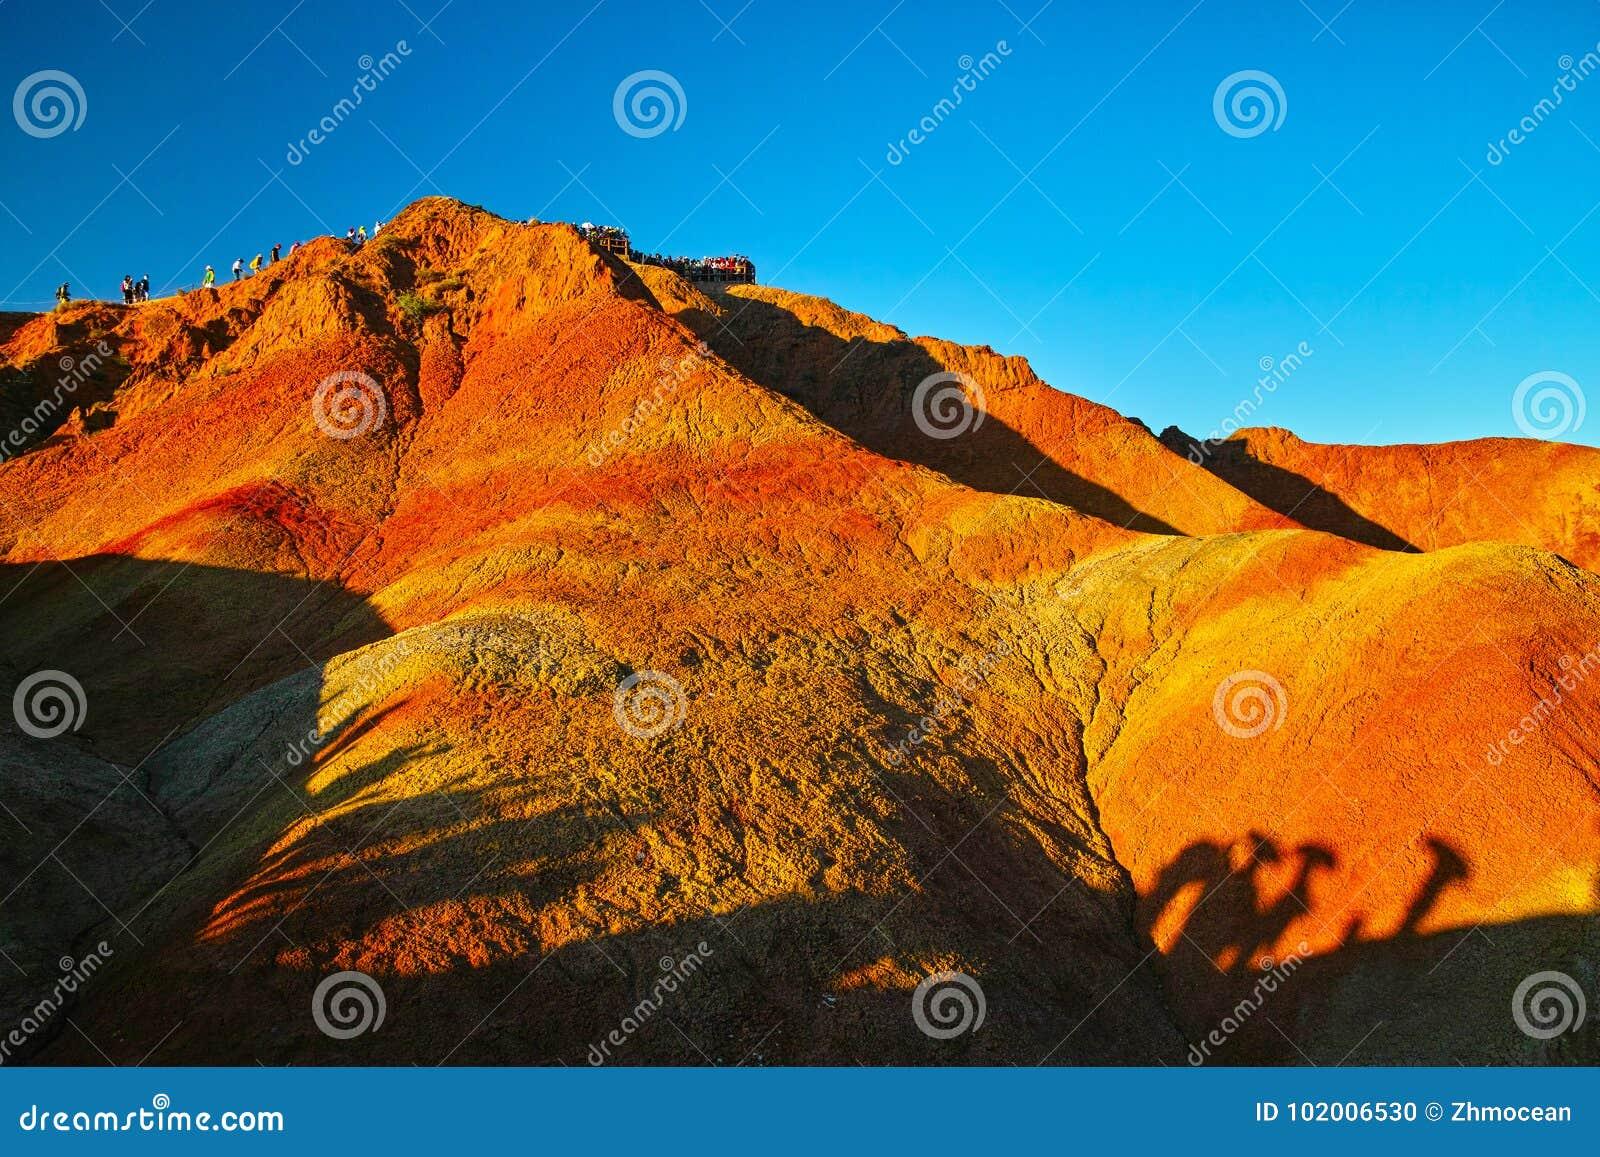 China Gansu Zhangye Danxia Geomorphic Geological Park